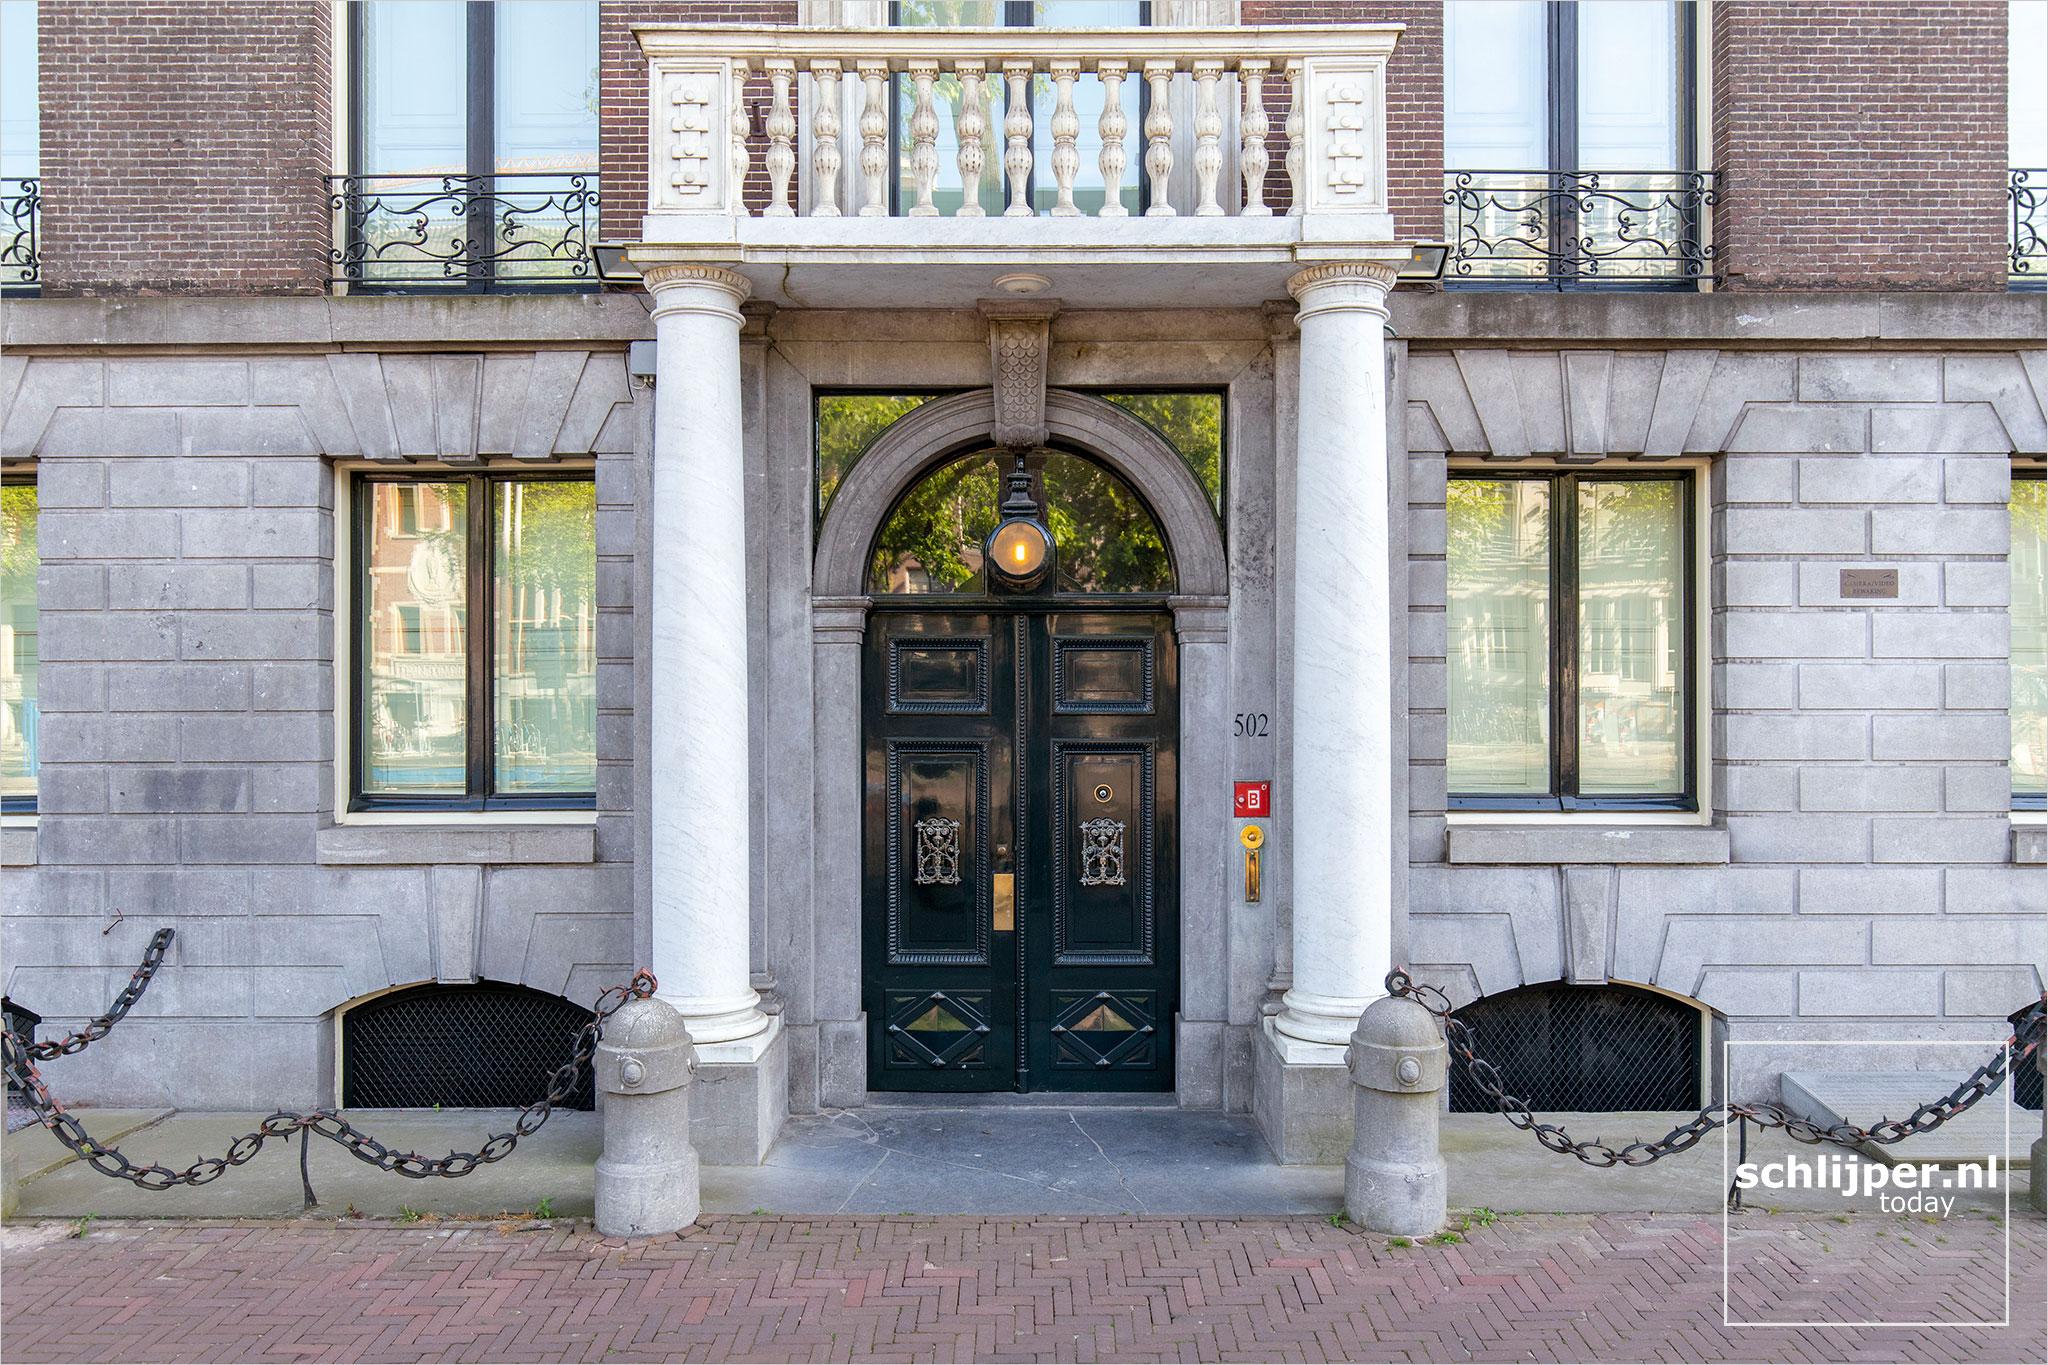 Nederland, Amsterdam, 20 mei 2020